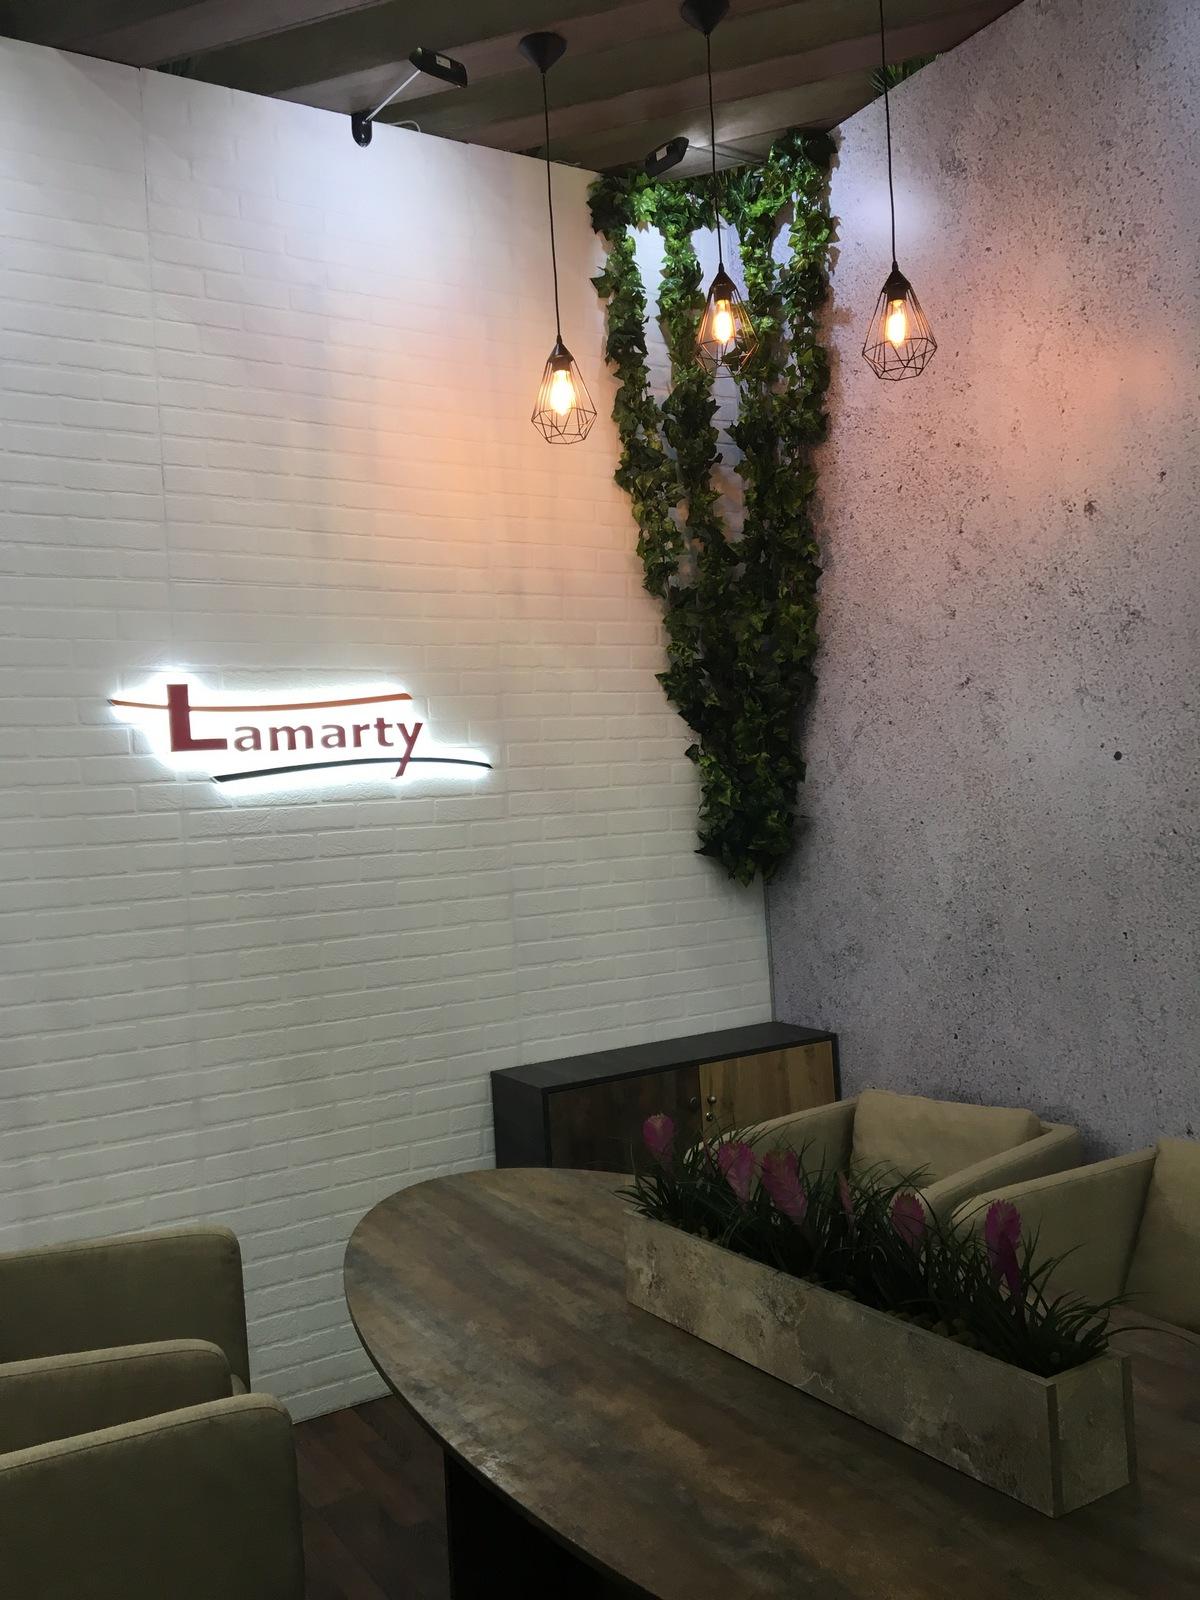 Lamarty-17